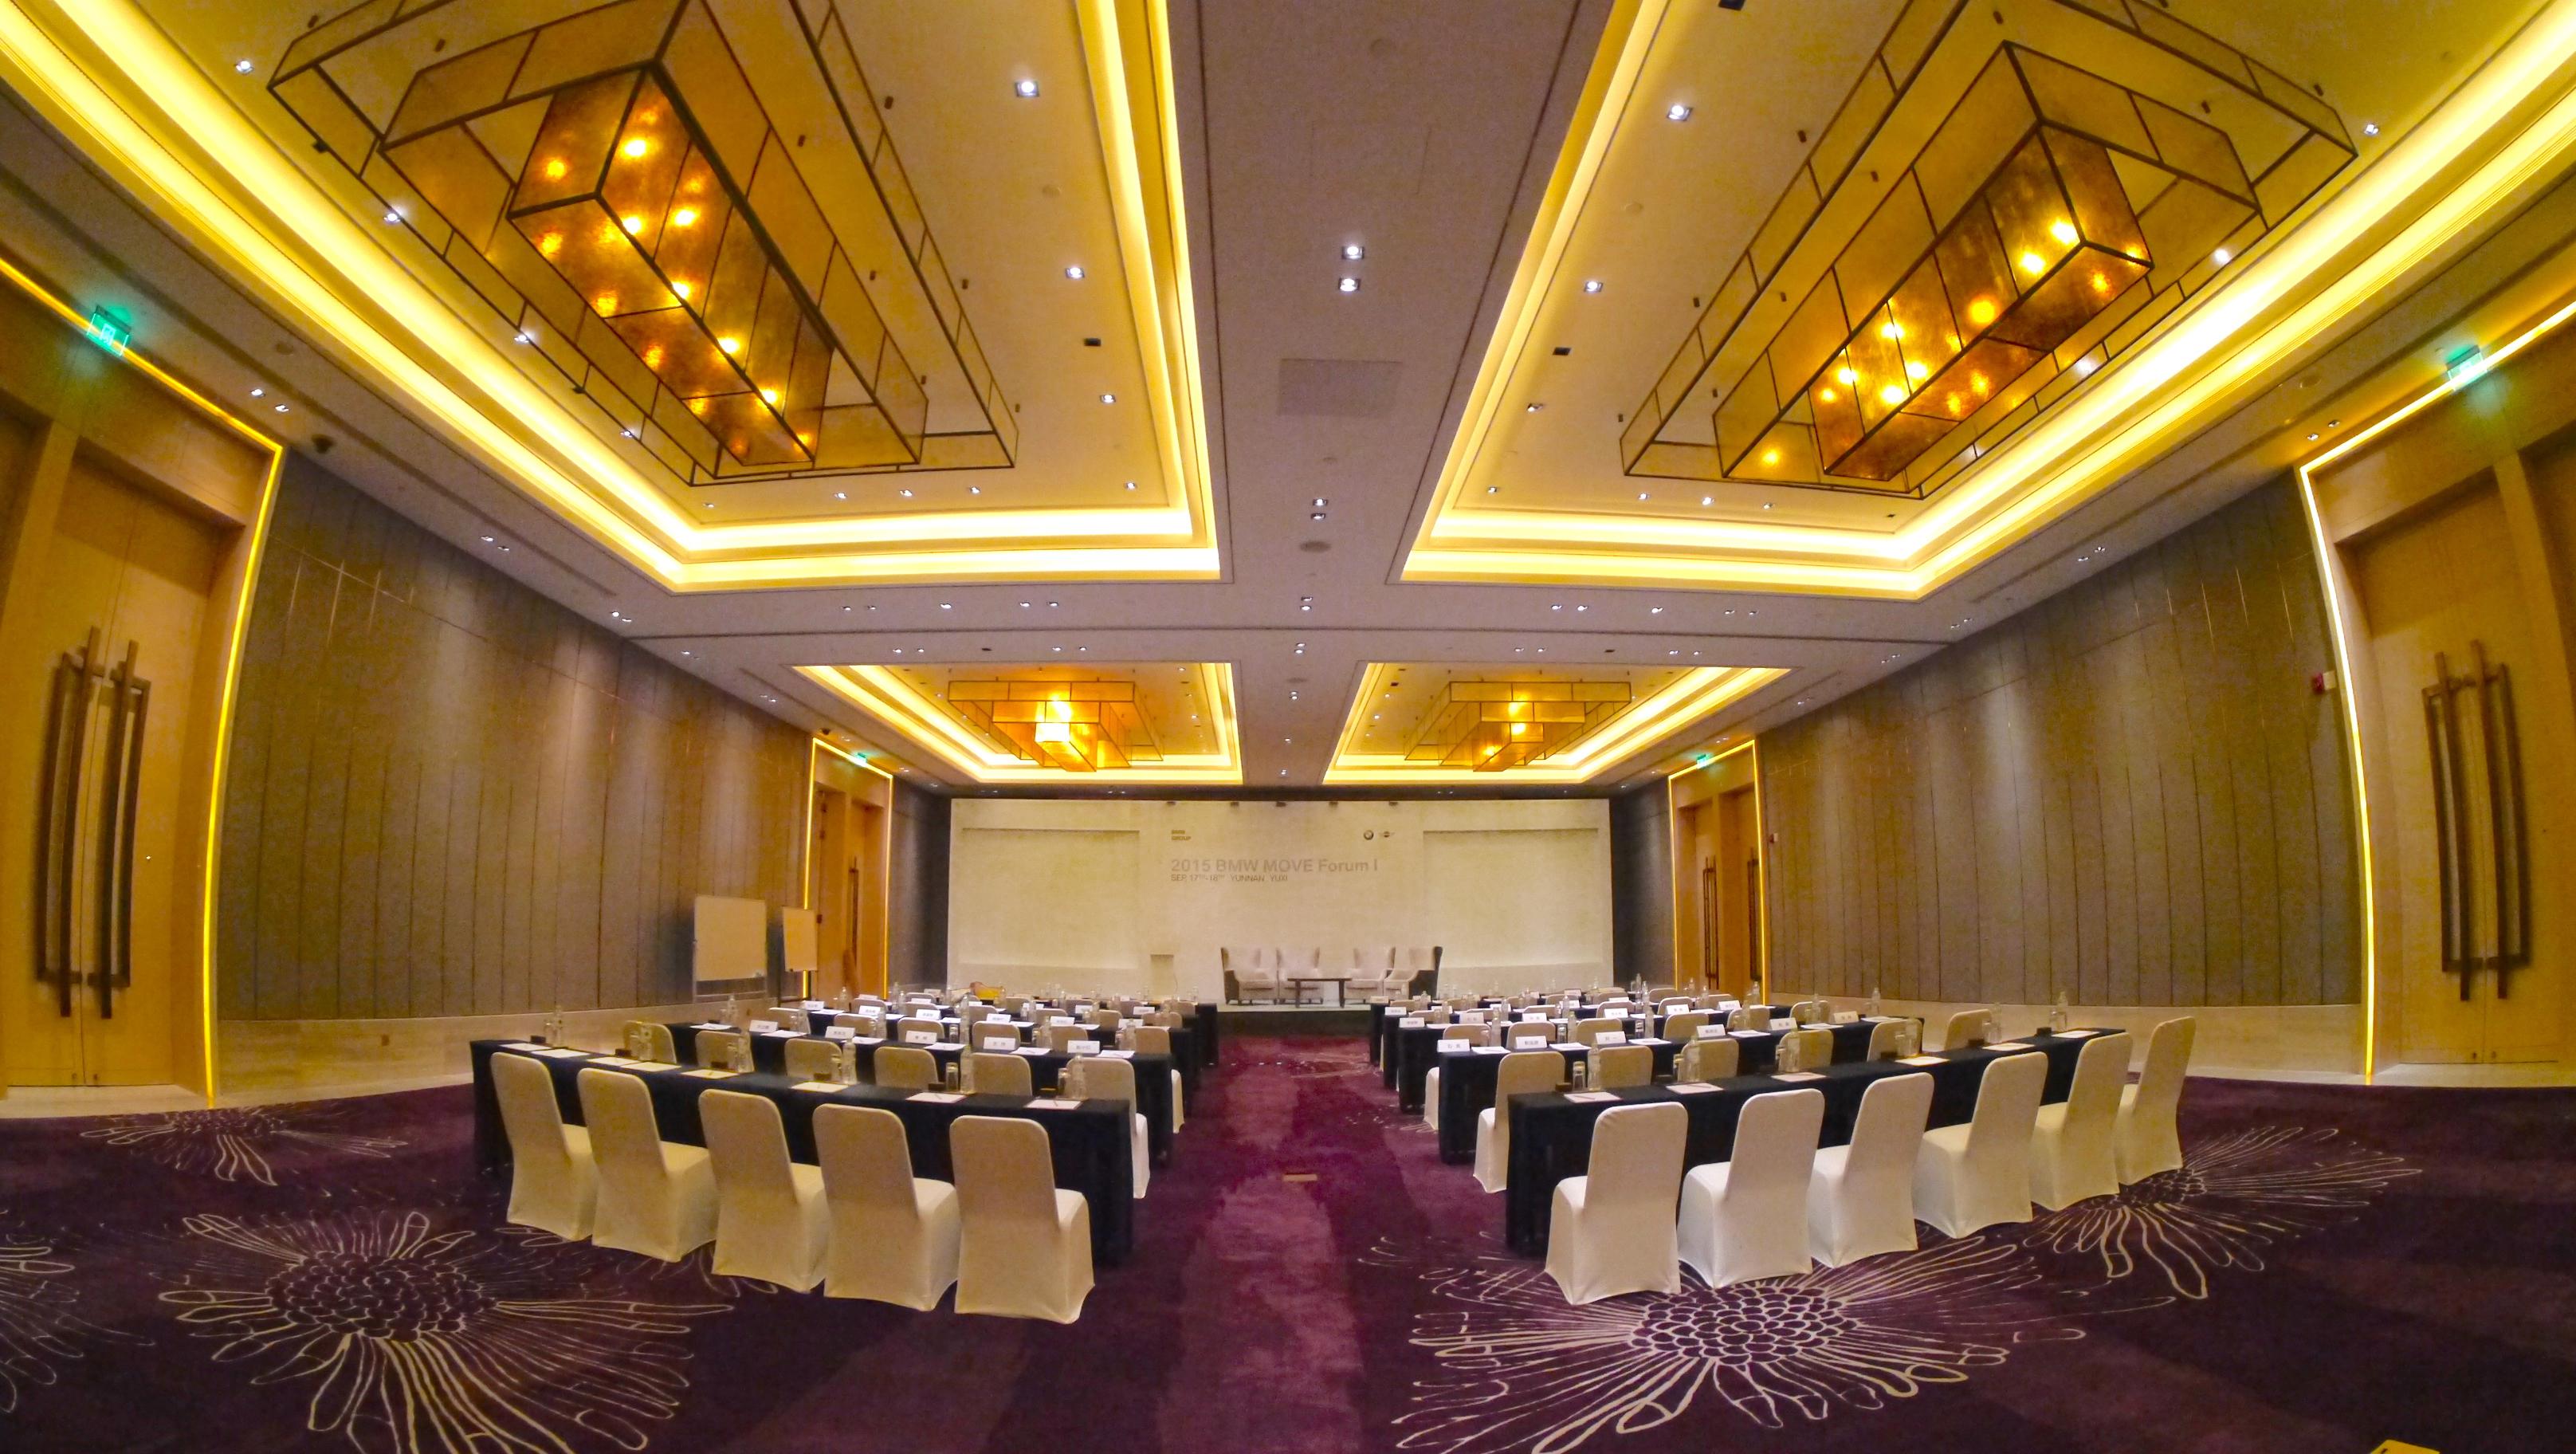 Socialight 14 Hilton Fuxian Lake Conference Room 1